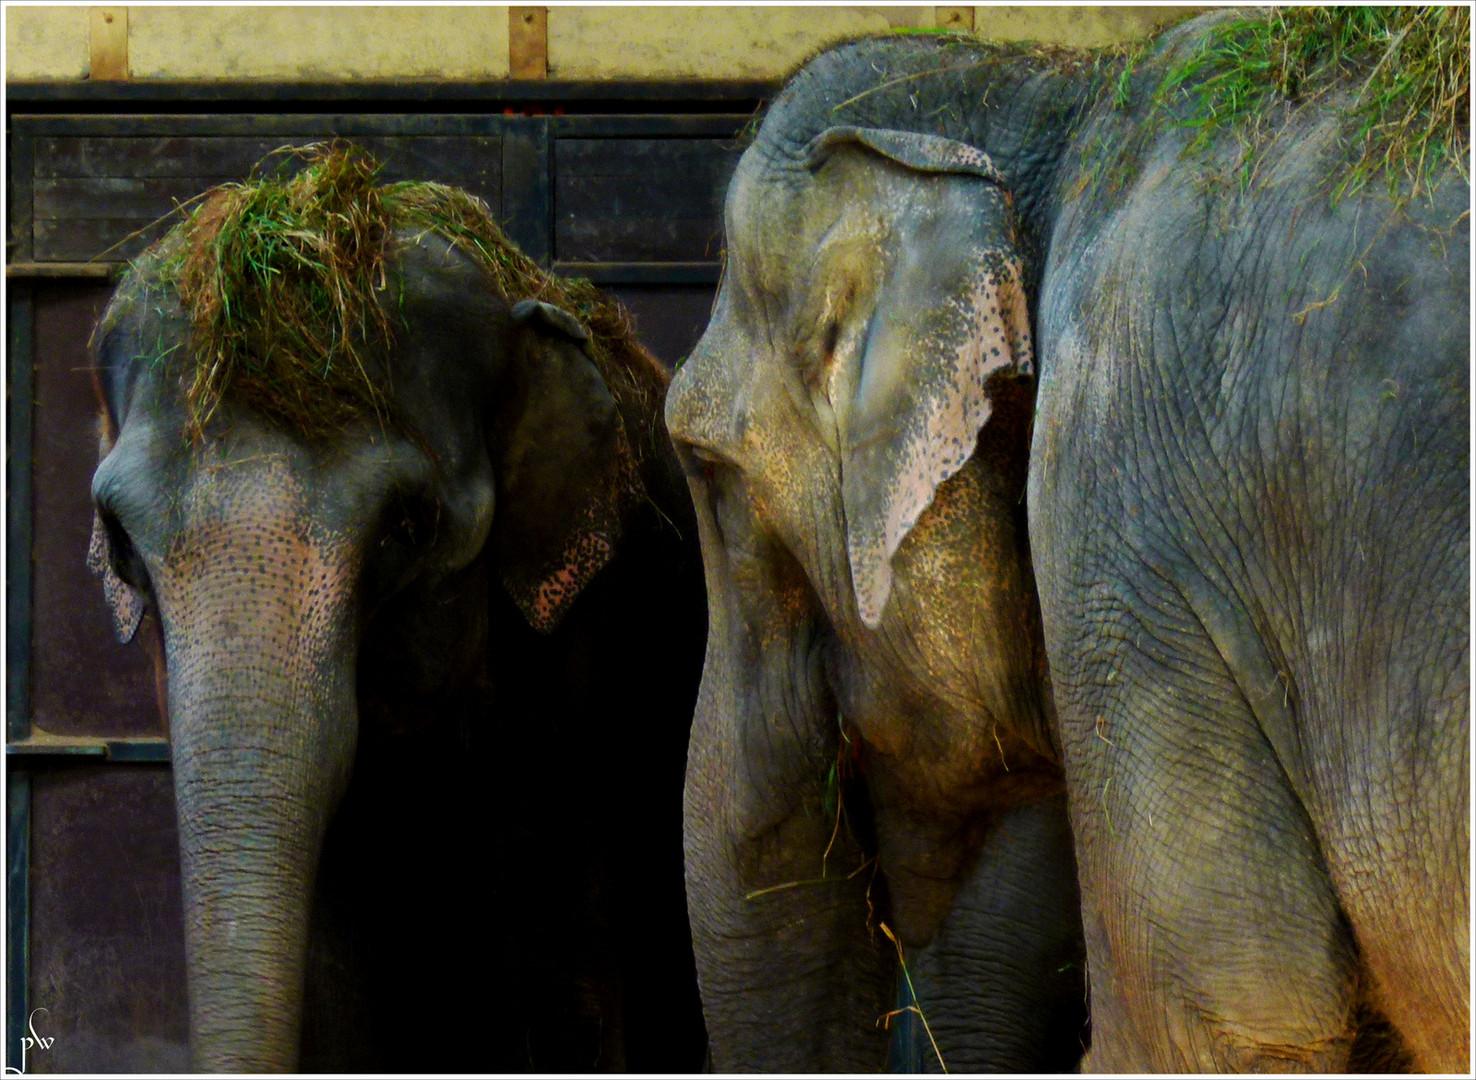 Hagenbecks Elefanten - Small talk